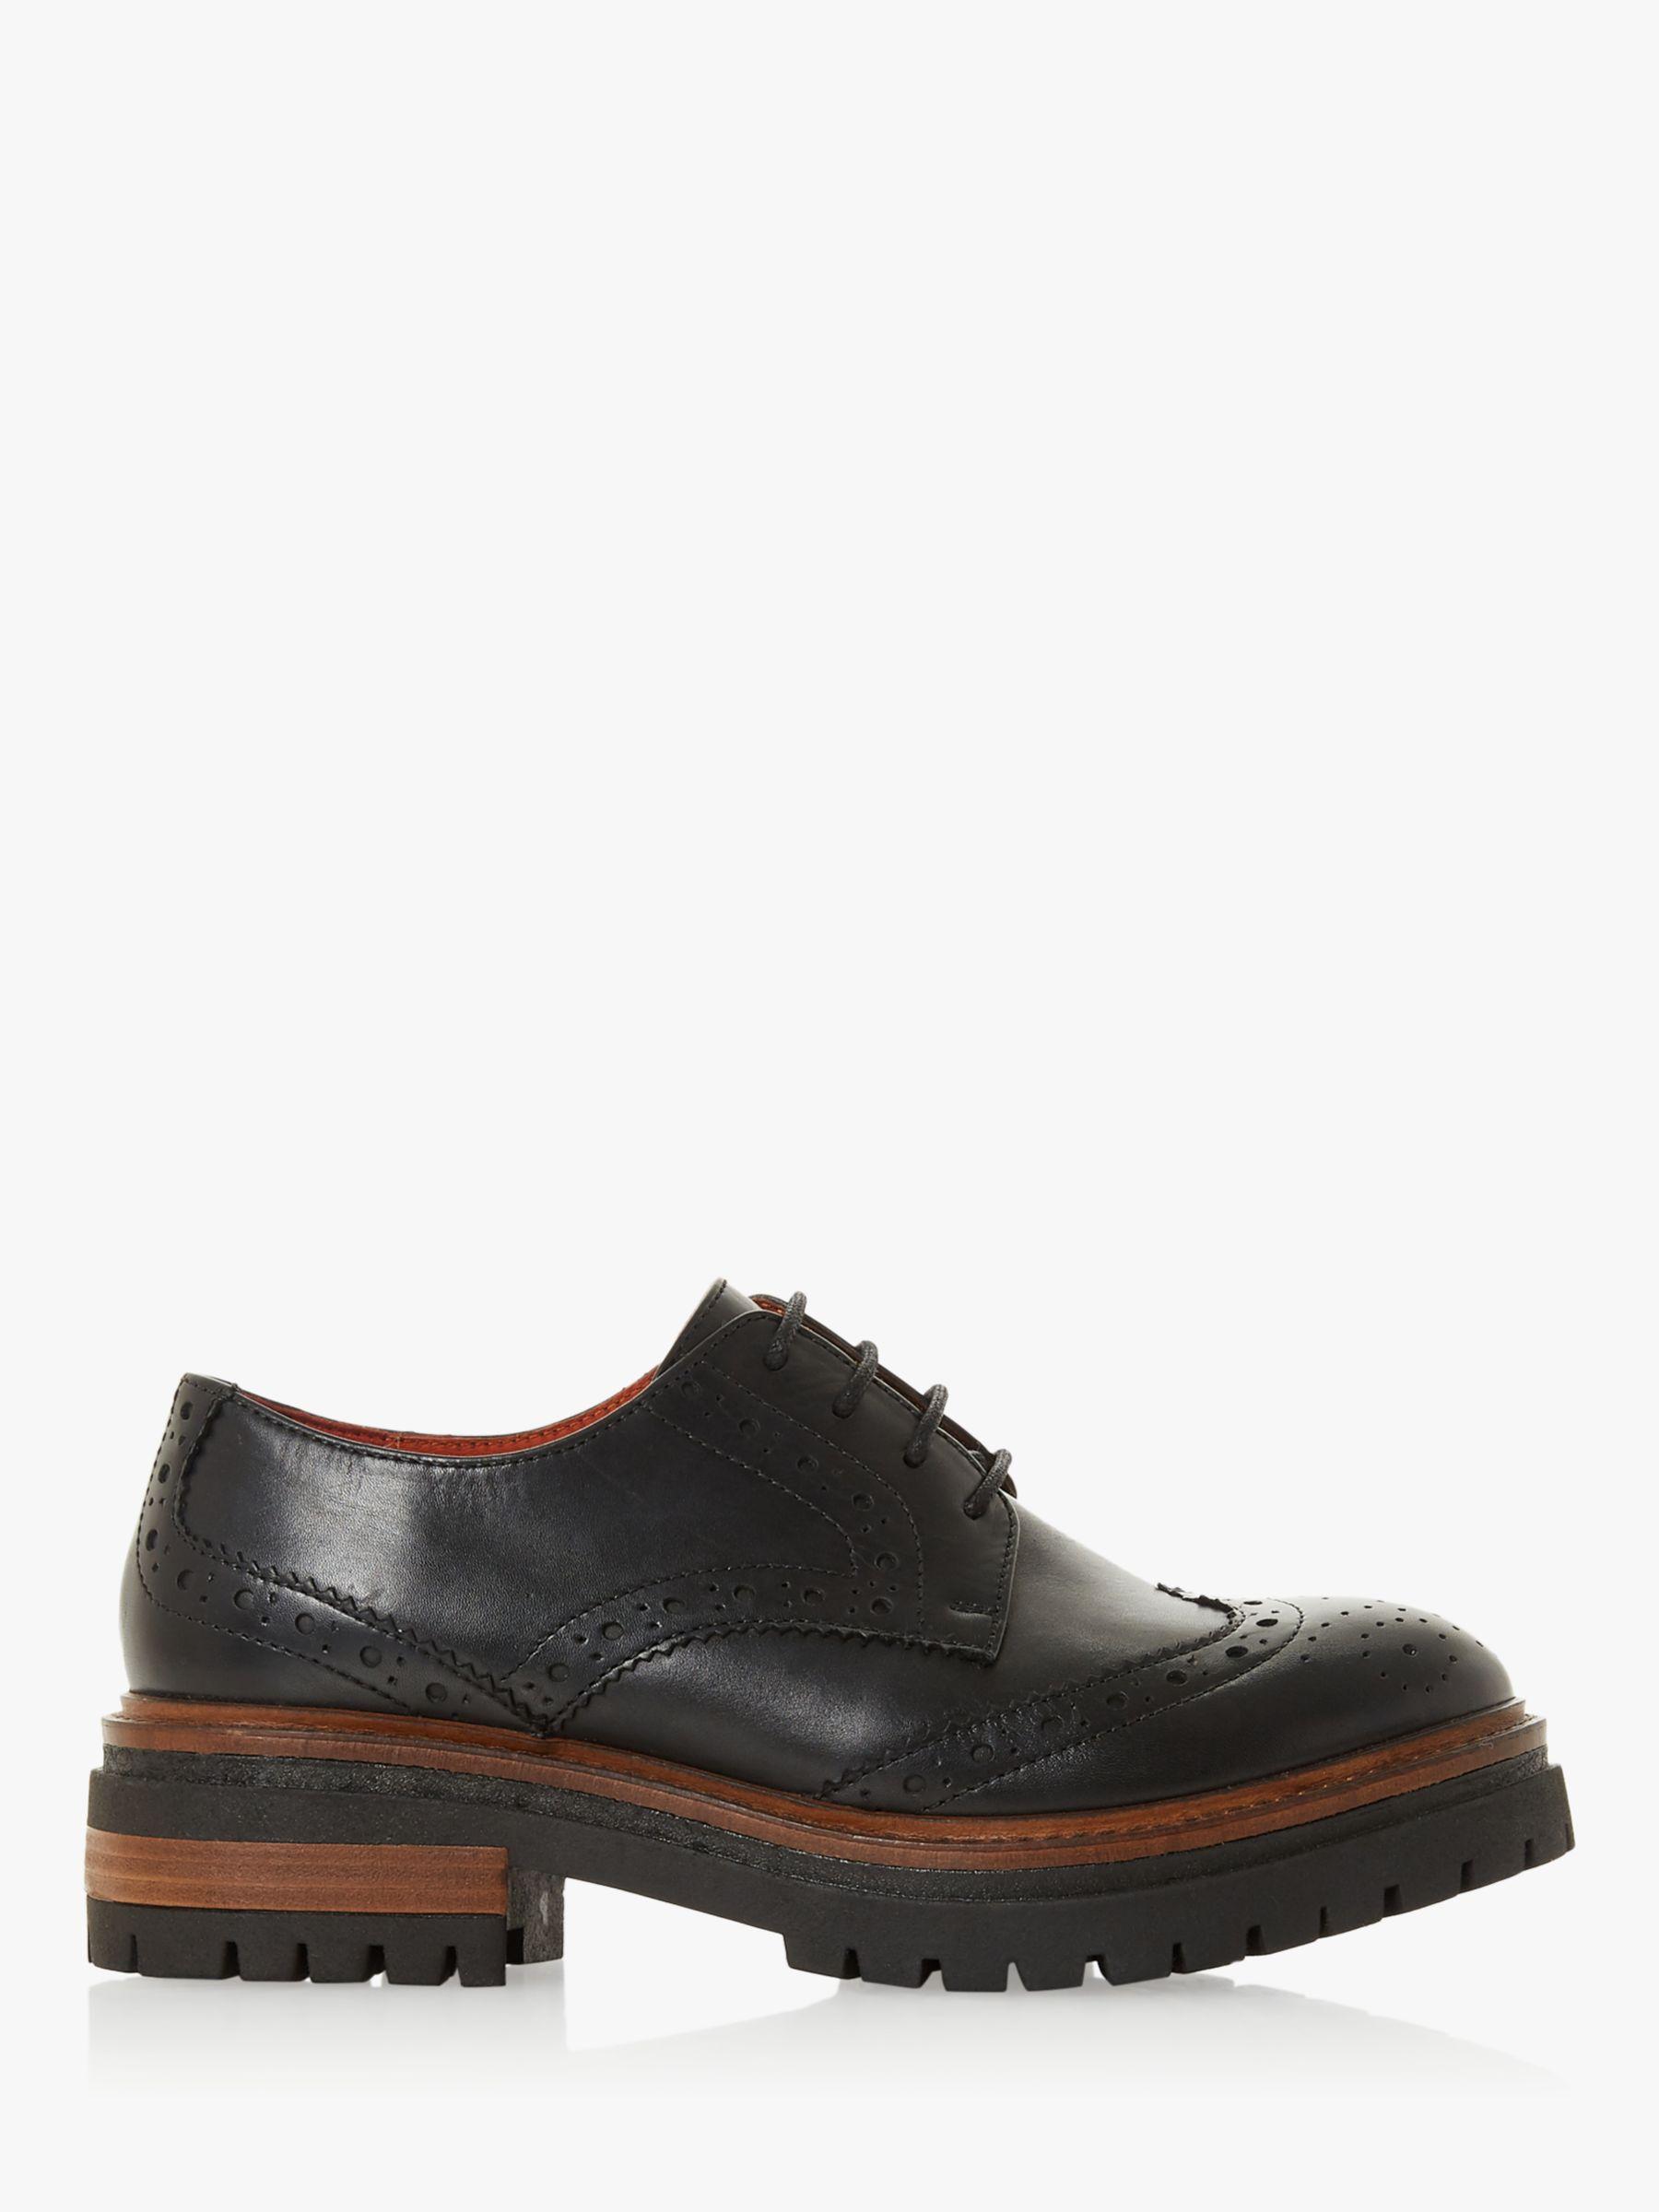 Bertie Bertie Fantasy Leather Lace Up Brogues, Black